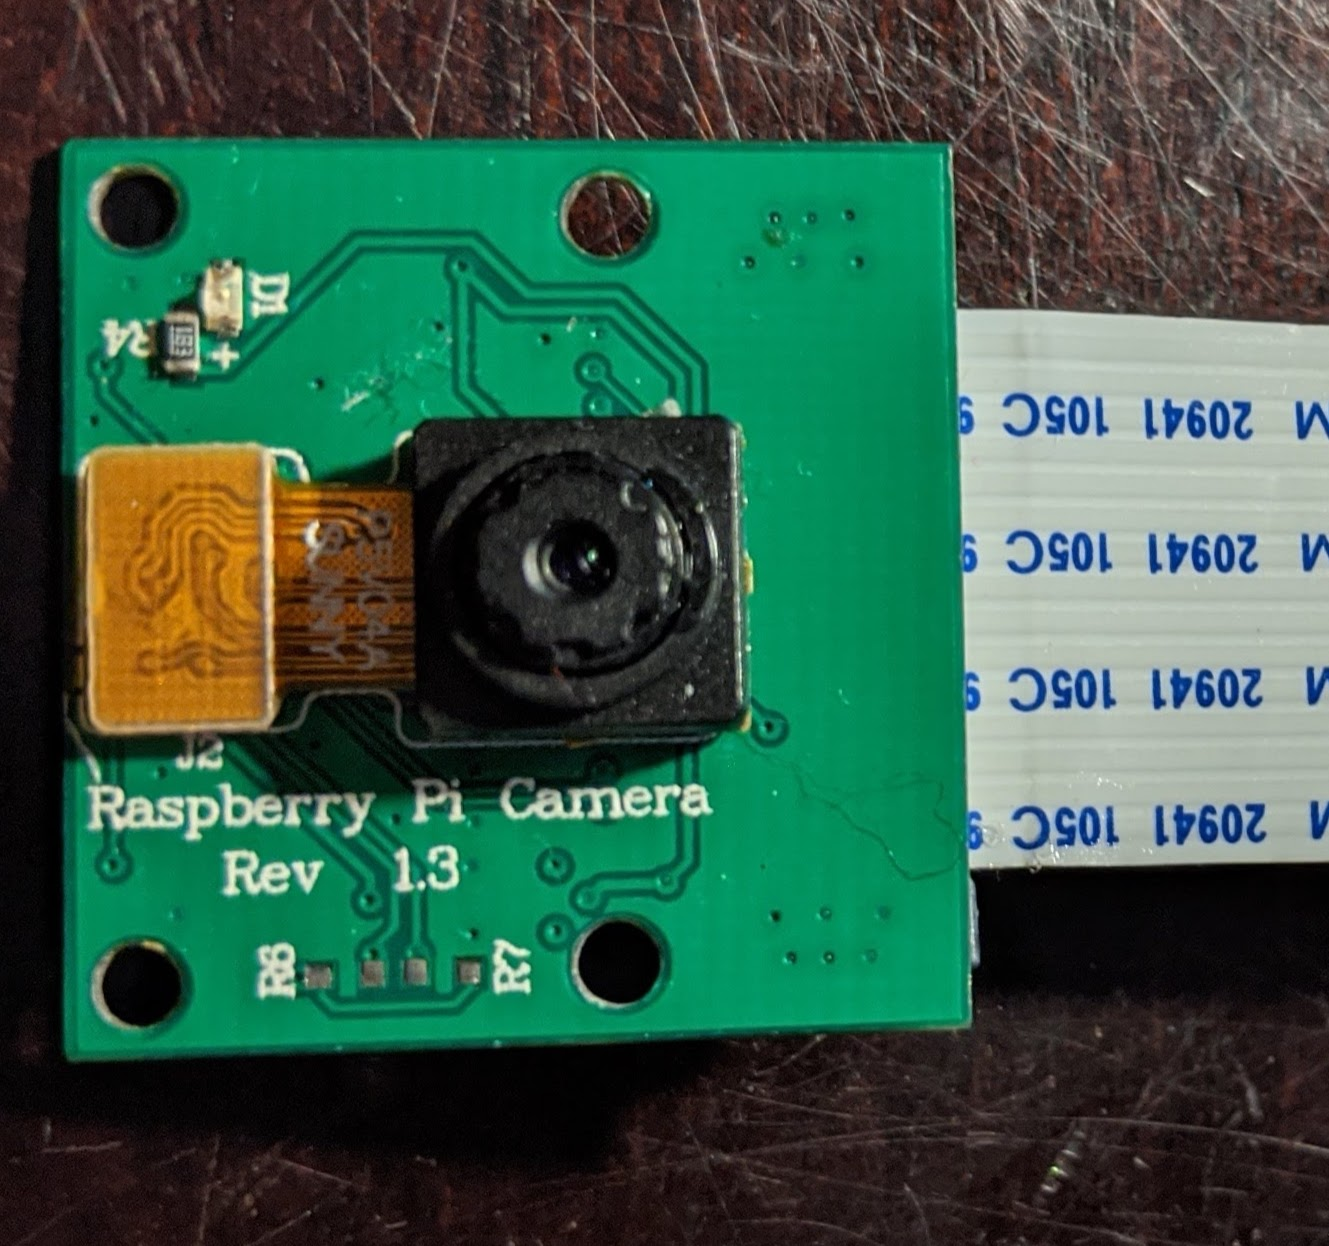 Raspberry Pi Camera v1.3